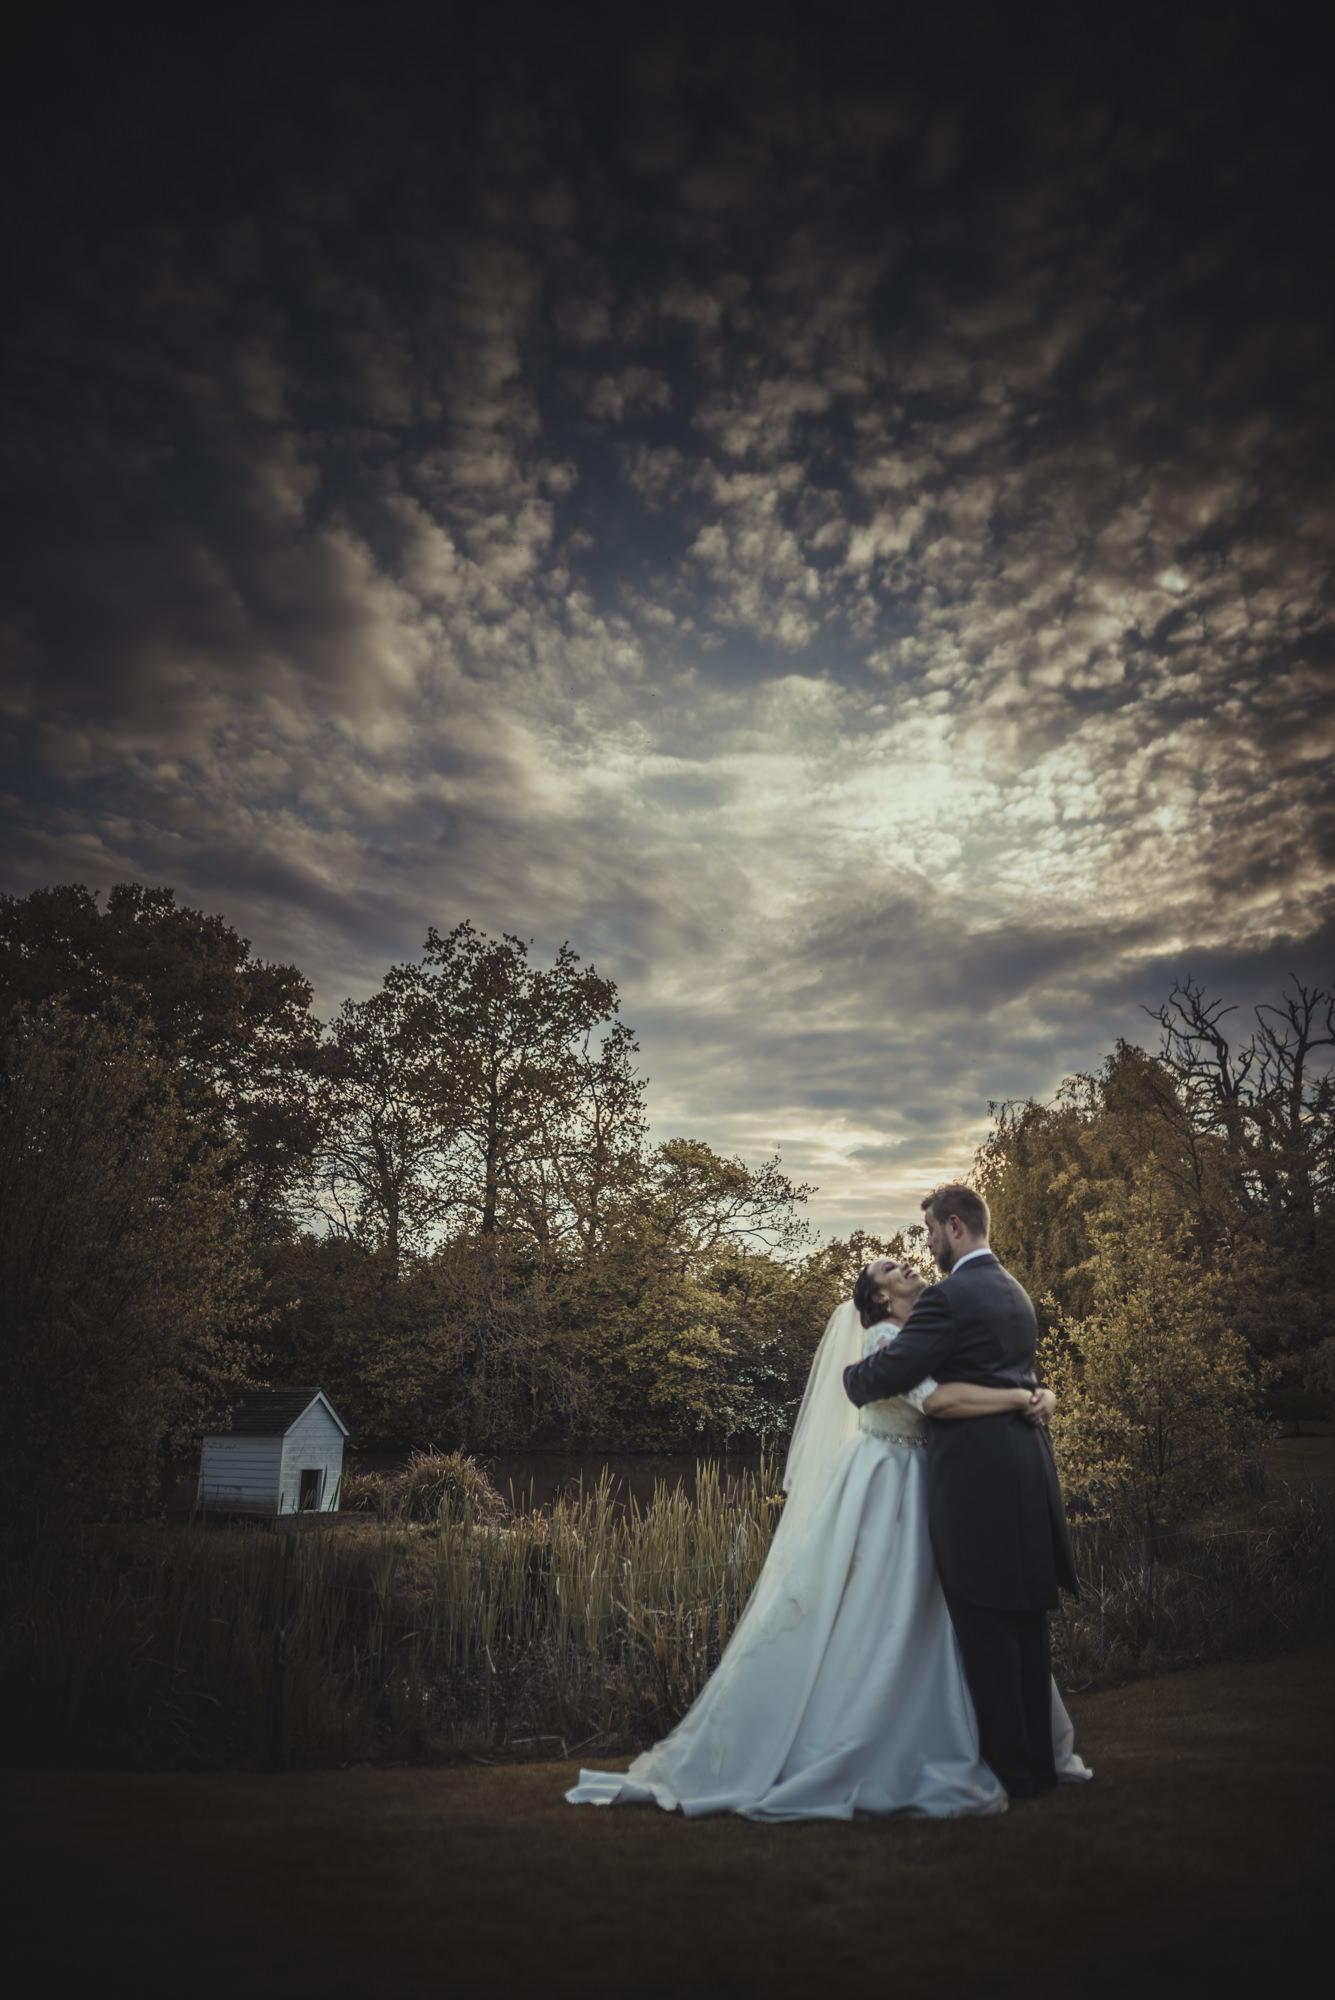 Jacqueline-Gareth-Wedding-Westmead-Events-Surrey-Manu-Mendoza-Wedding-Photography-489.jpg